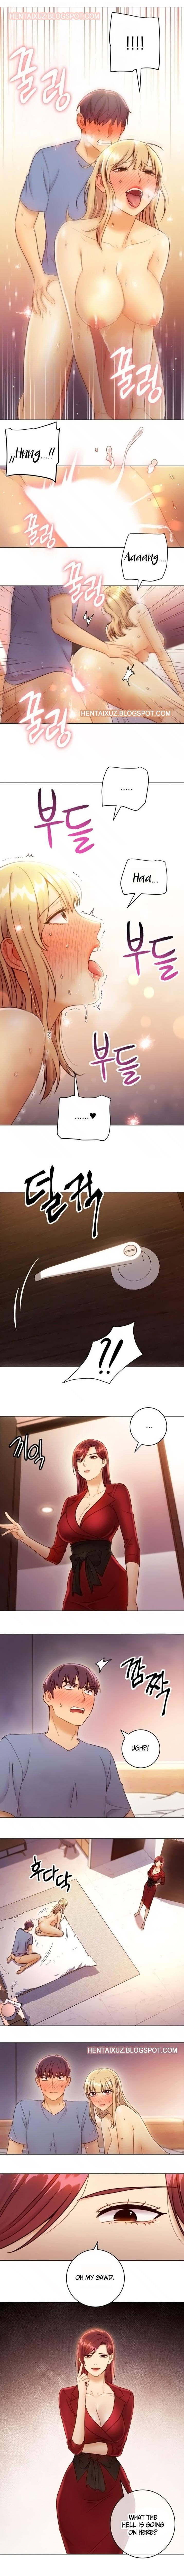 [Neck Pilllow] Stepmother Friends Ch.39/? [English] [Hentai Universe] NEW! 13/10/2020 373